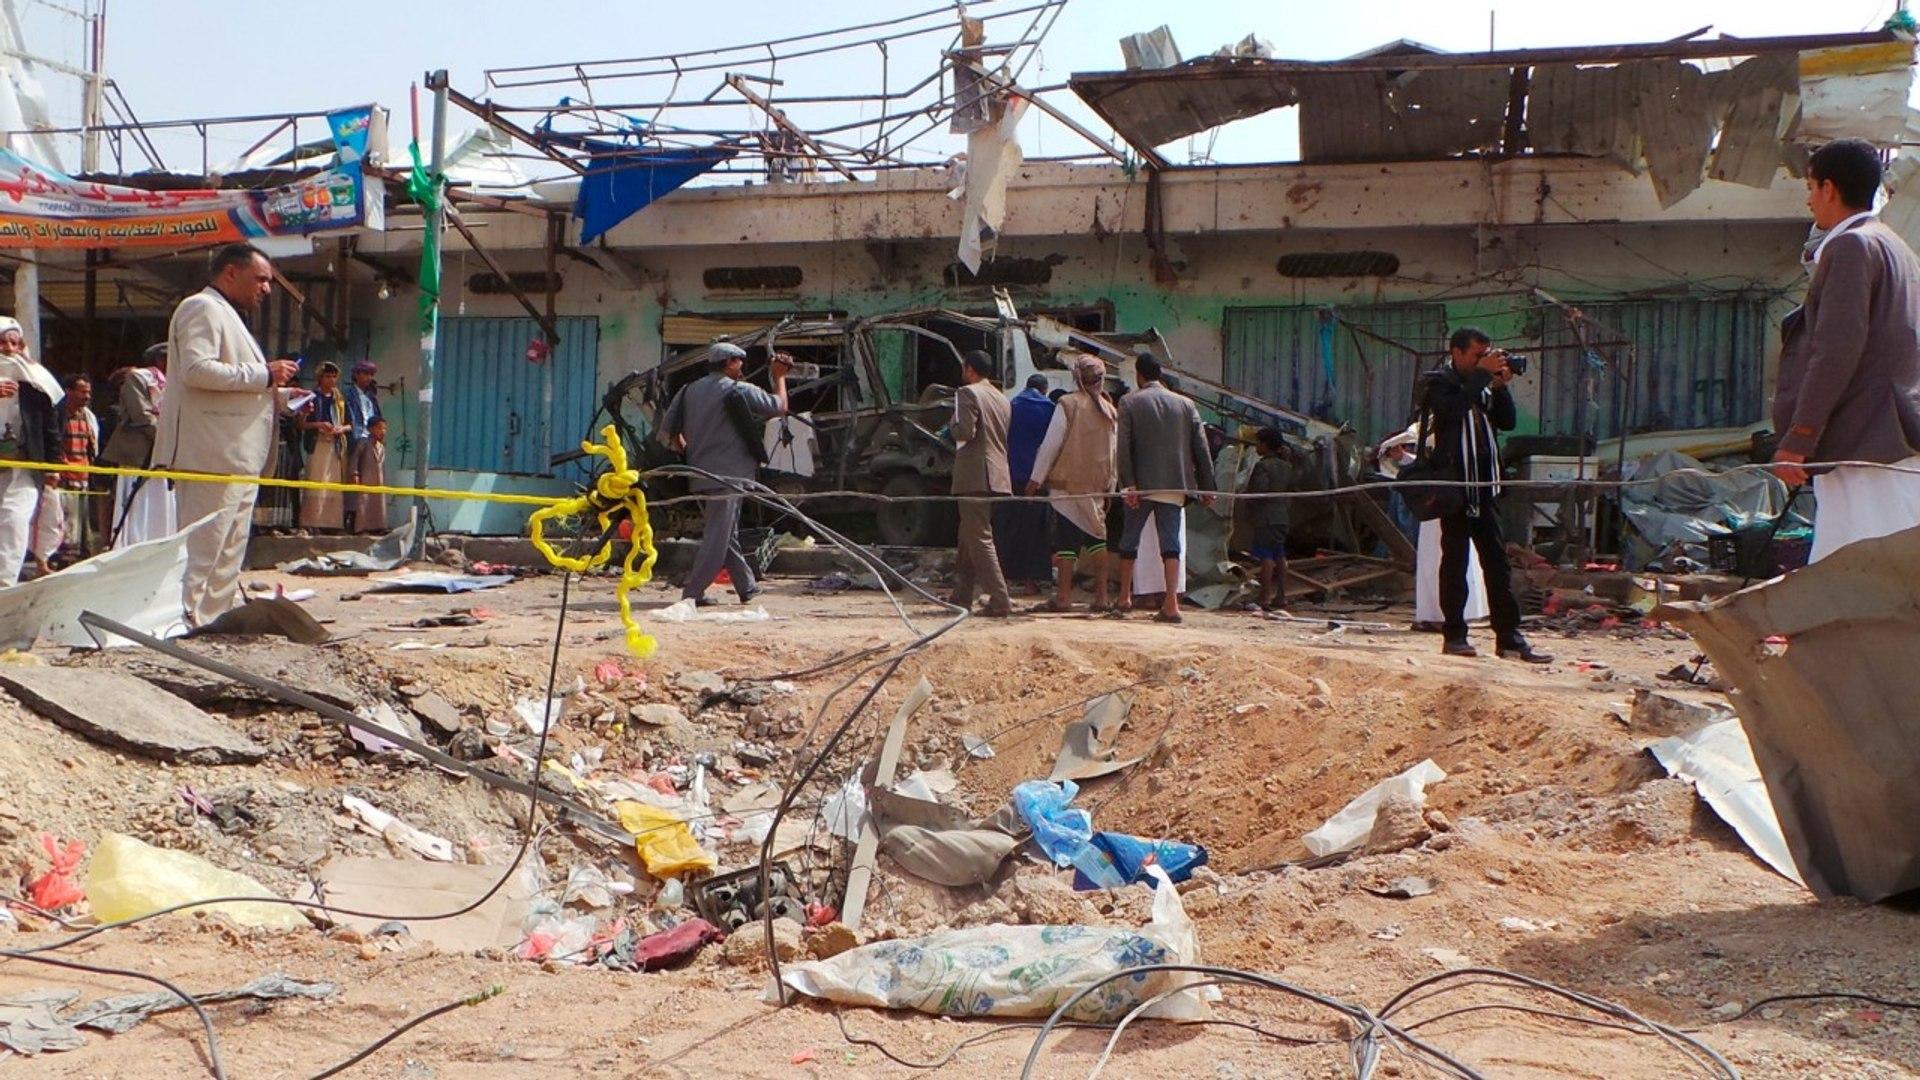 U.N. Security Council Urges Investigation Into Yemen Air Strike